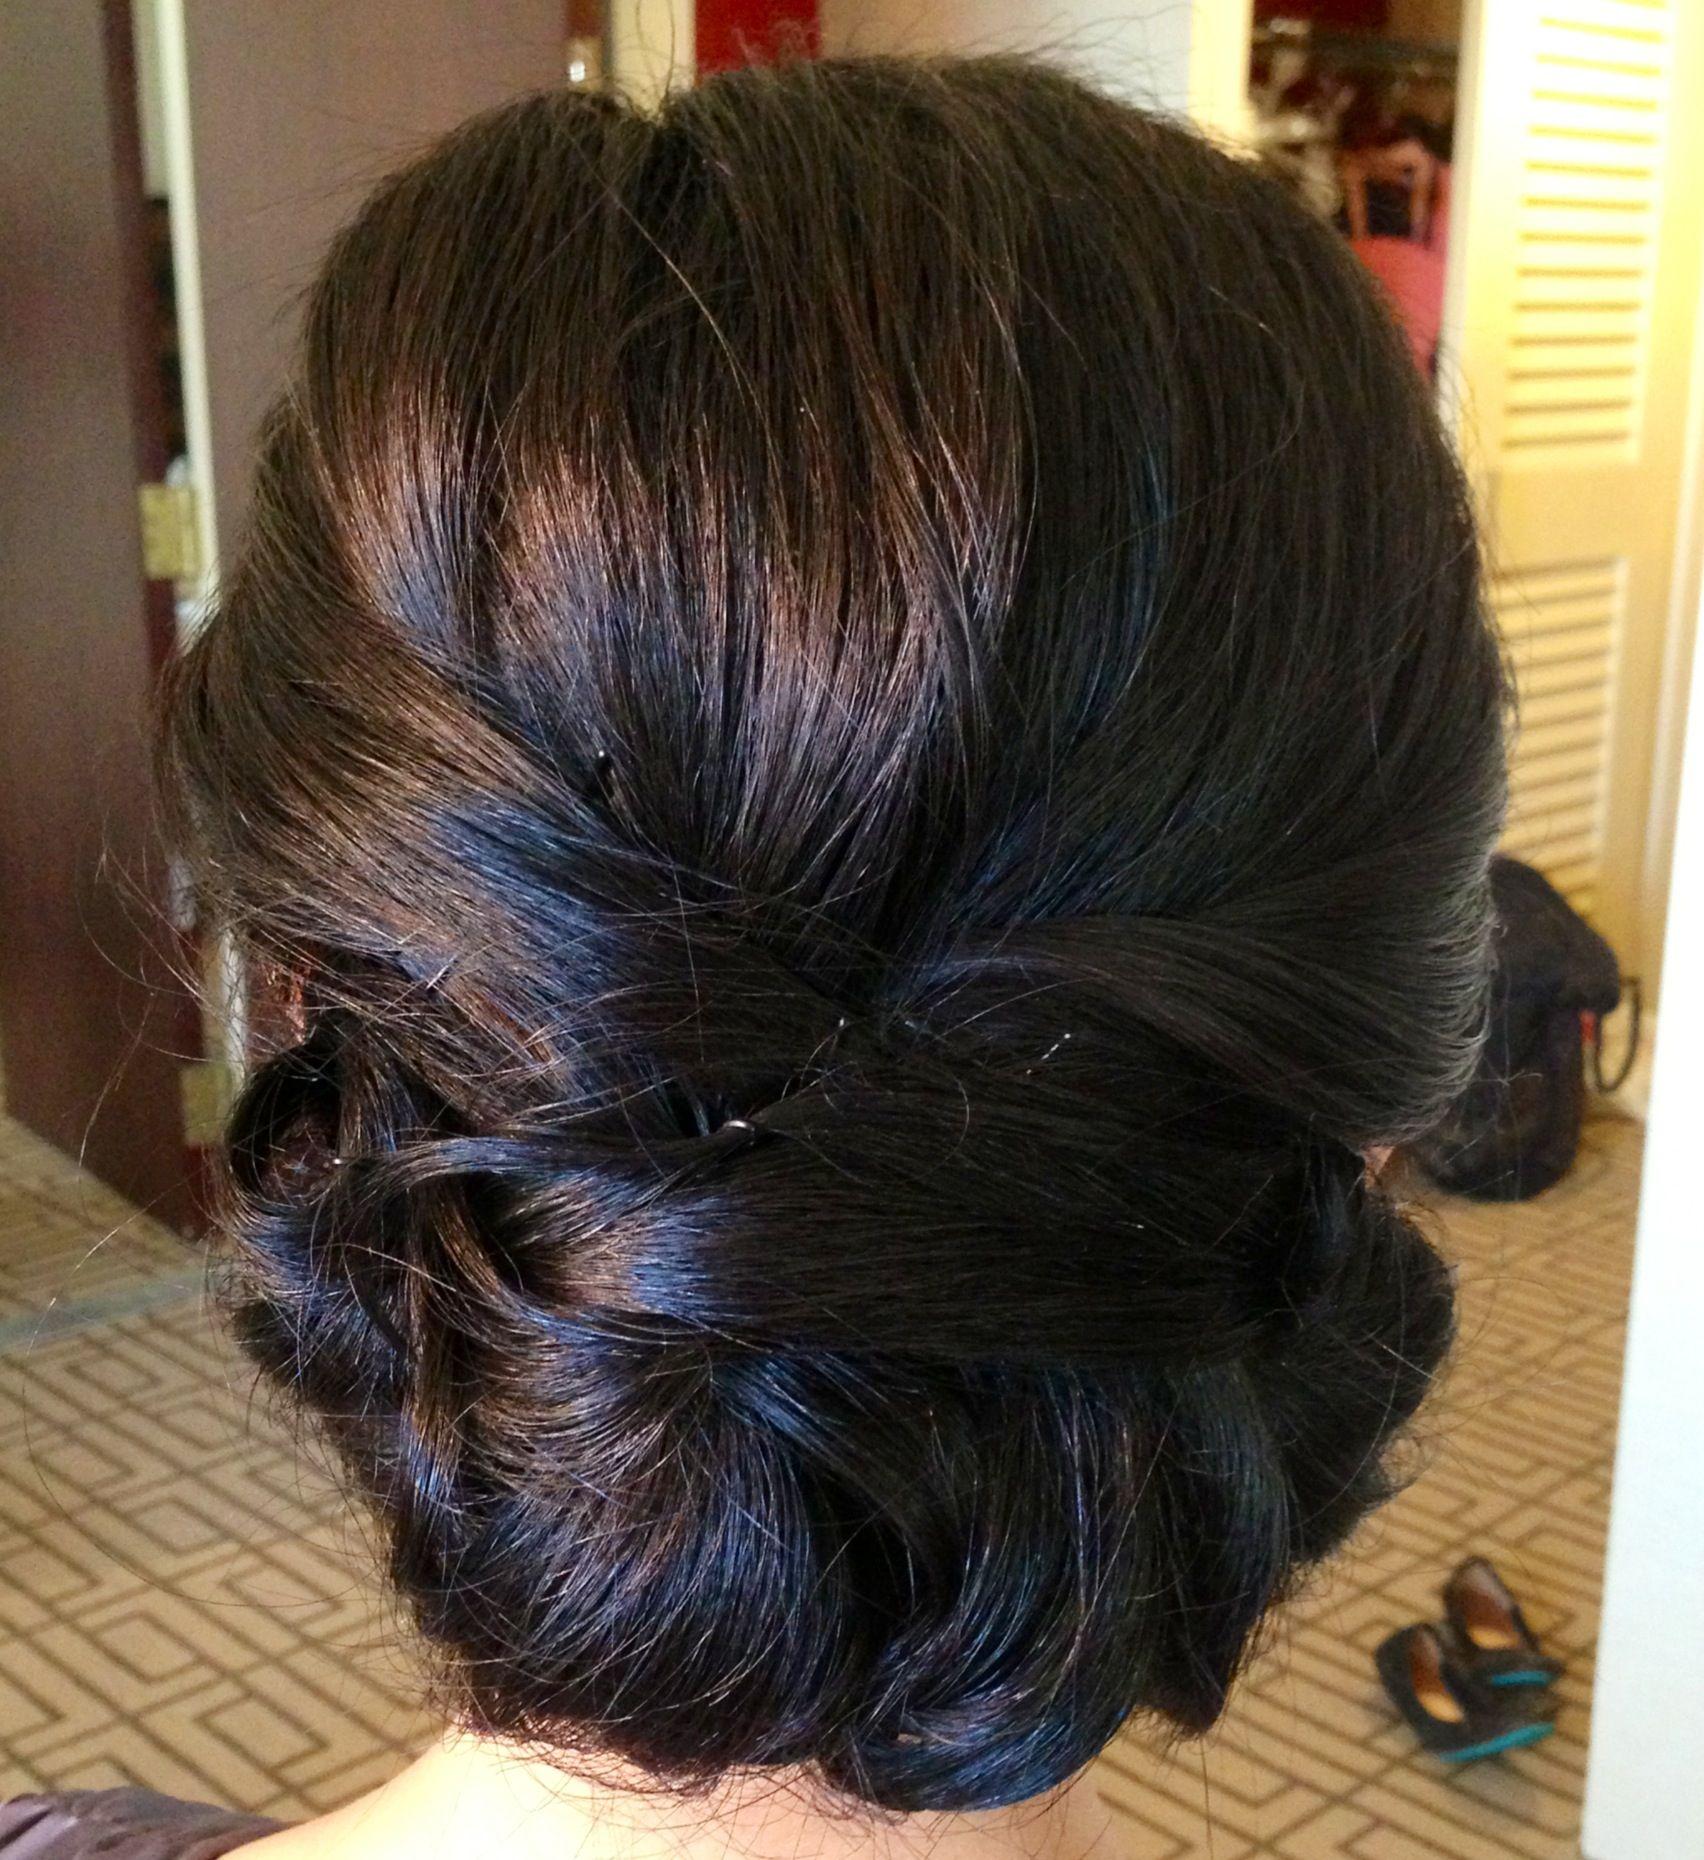 Wedding updos for long hair elegant wedding hairstyles wedding updos - Wedding Hairstyle For Long Hair Wedding Updo Wedding Hair Updo Classic Updo Chignon Asian Bridal Hair